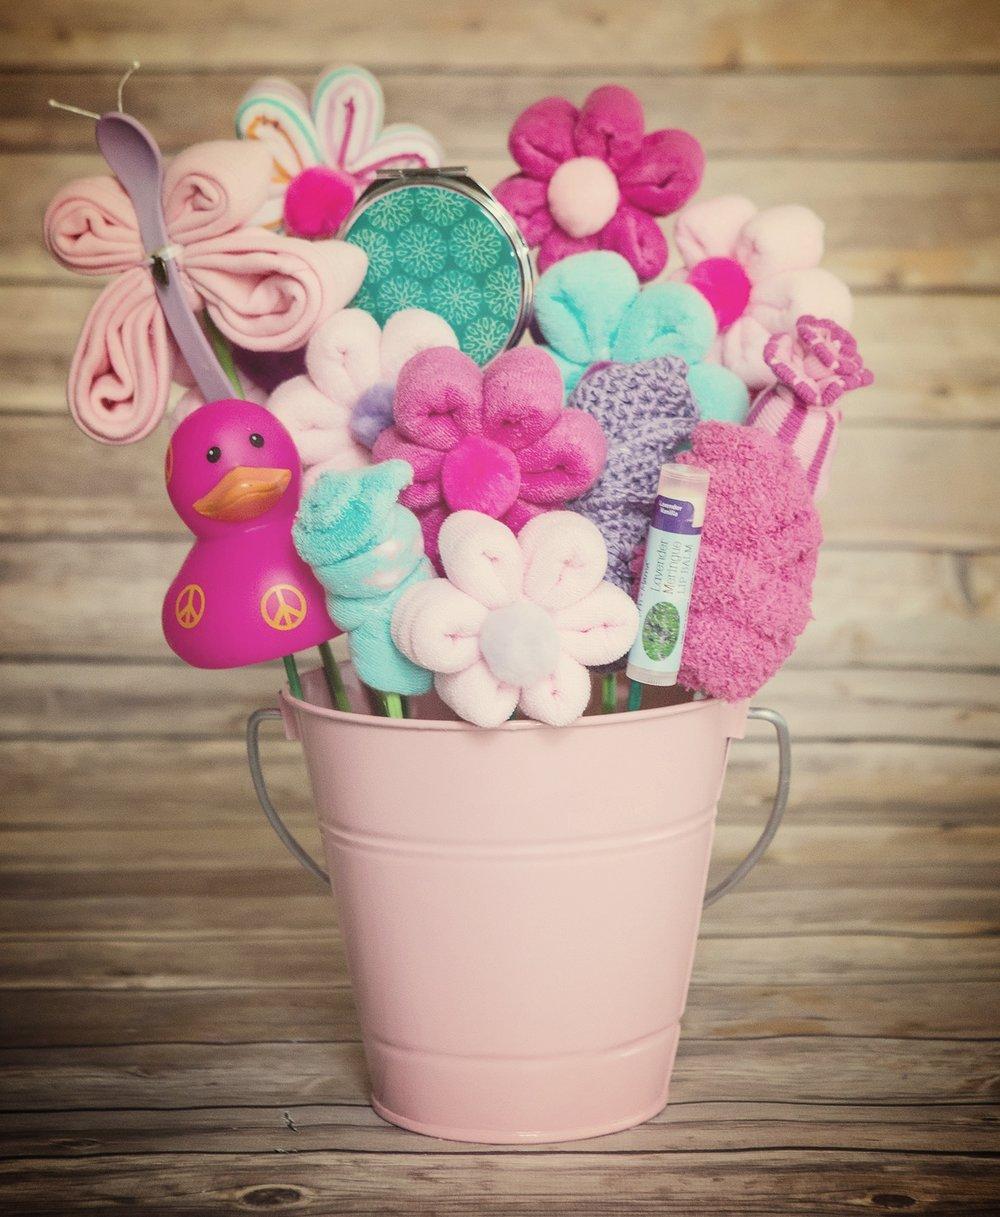 CK-pink-bucket.jpg